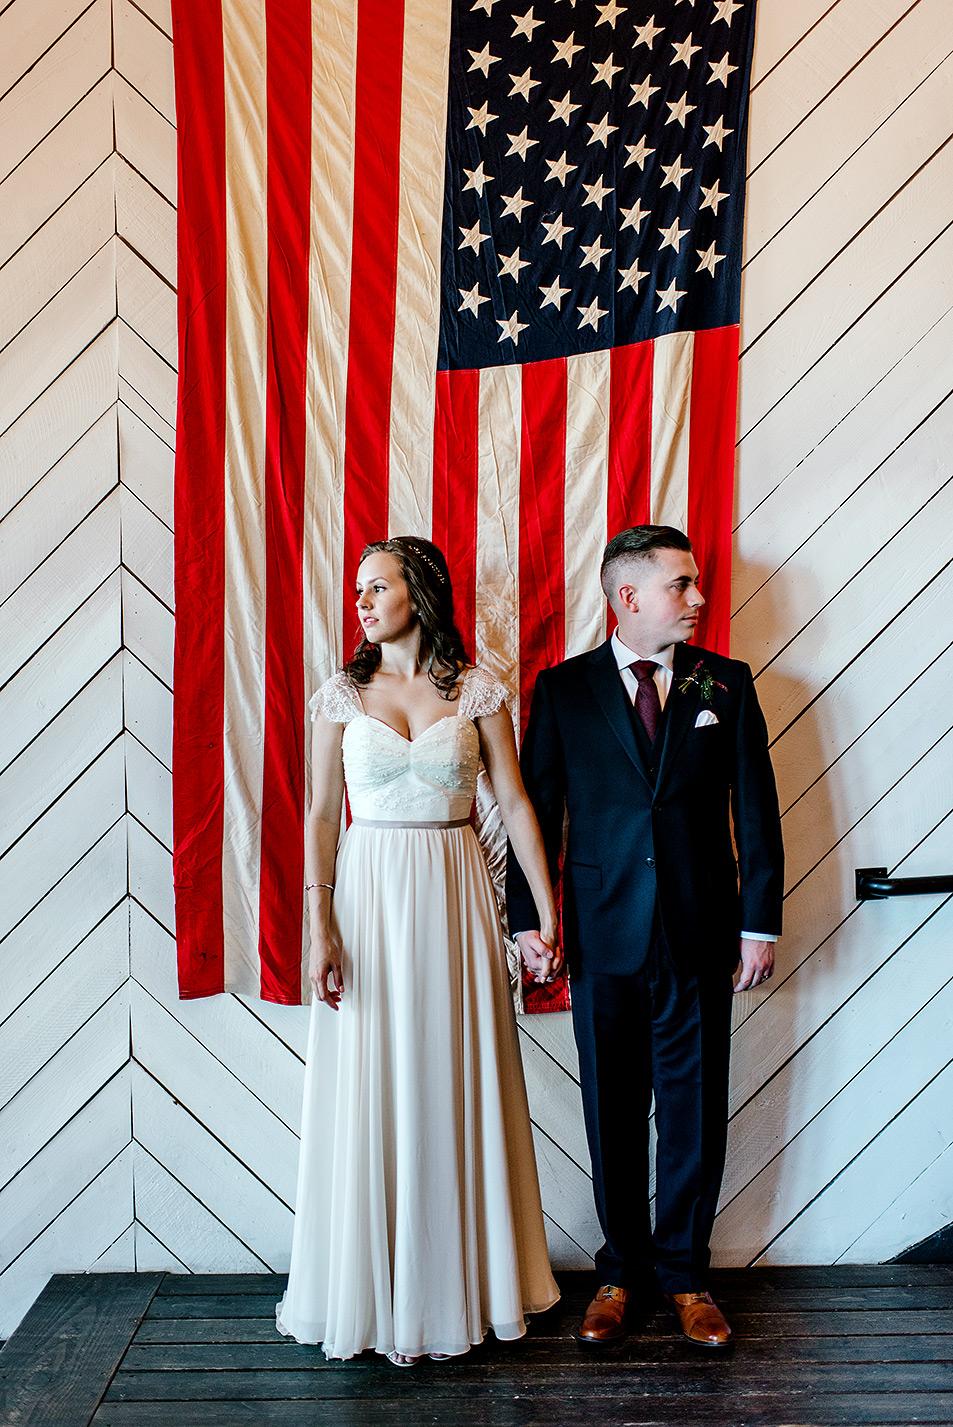 union-pine-the-loft-wedding9.jpg